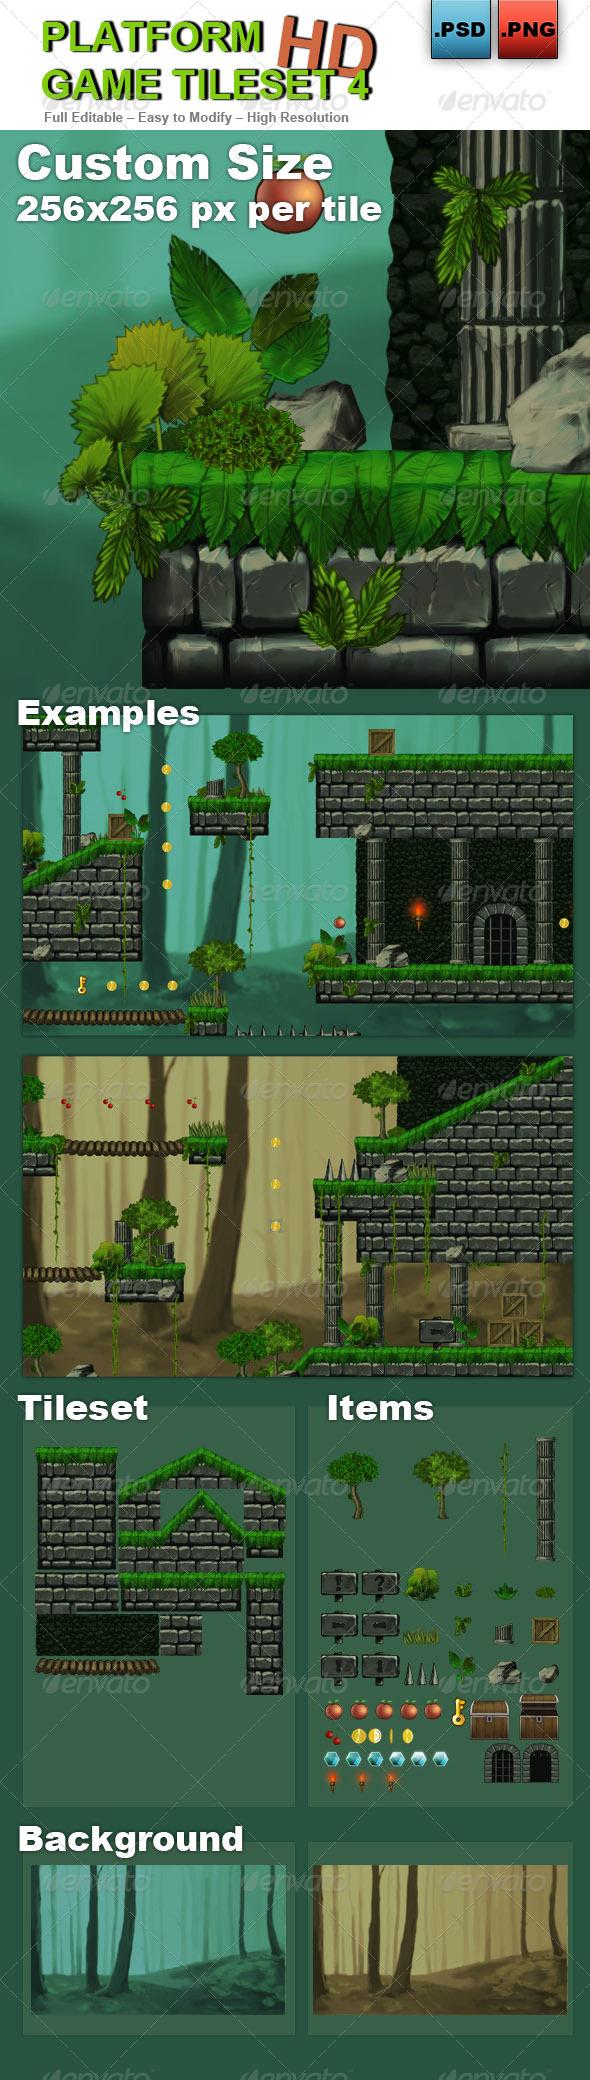 GraphicRiver Platform Game Tileset 4 HD 6727874